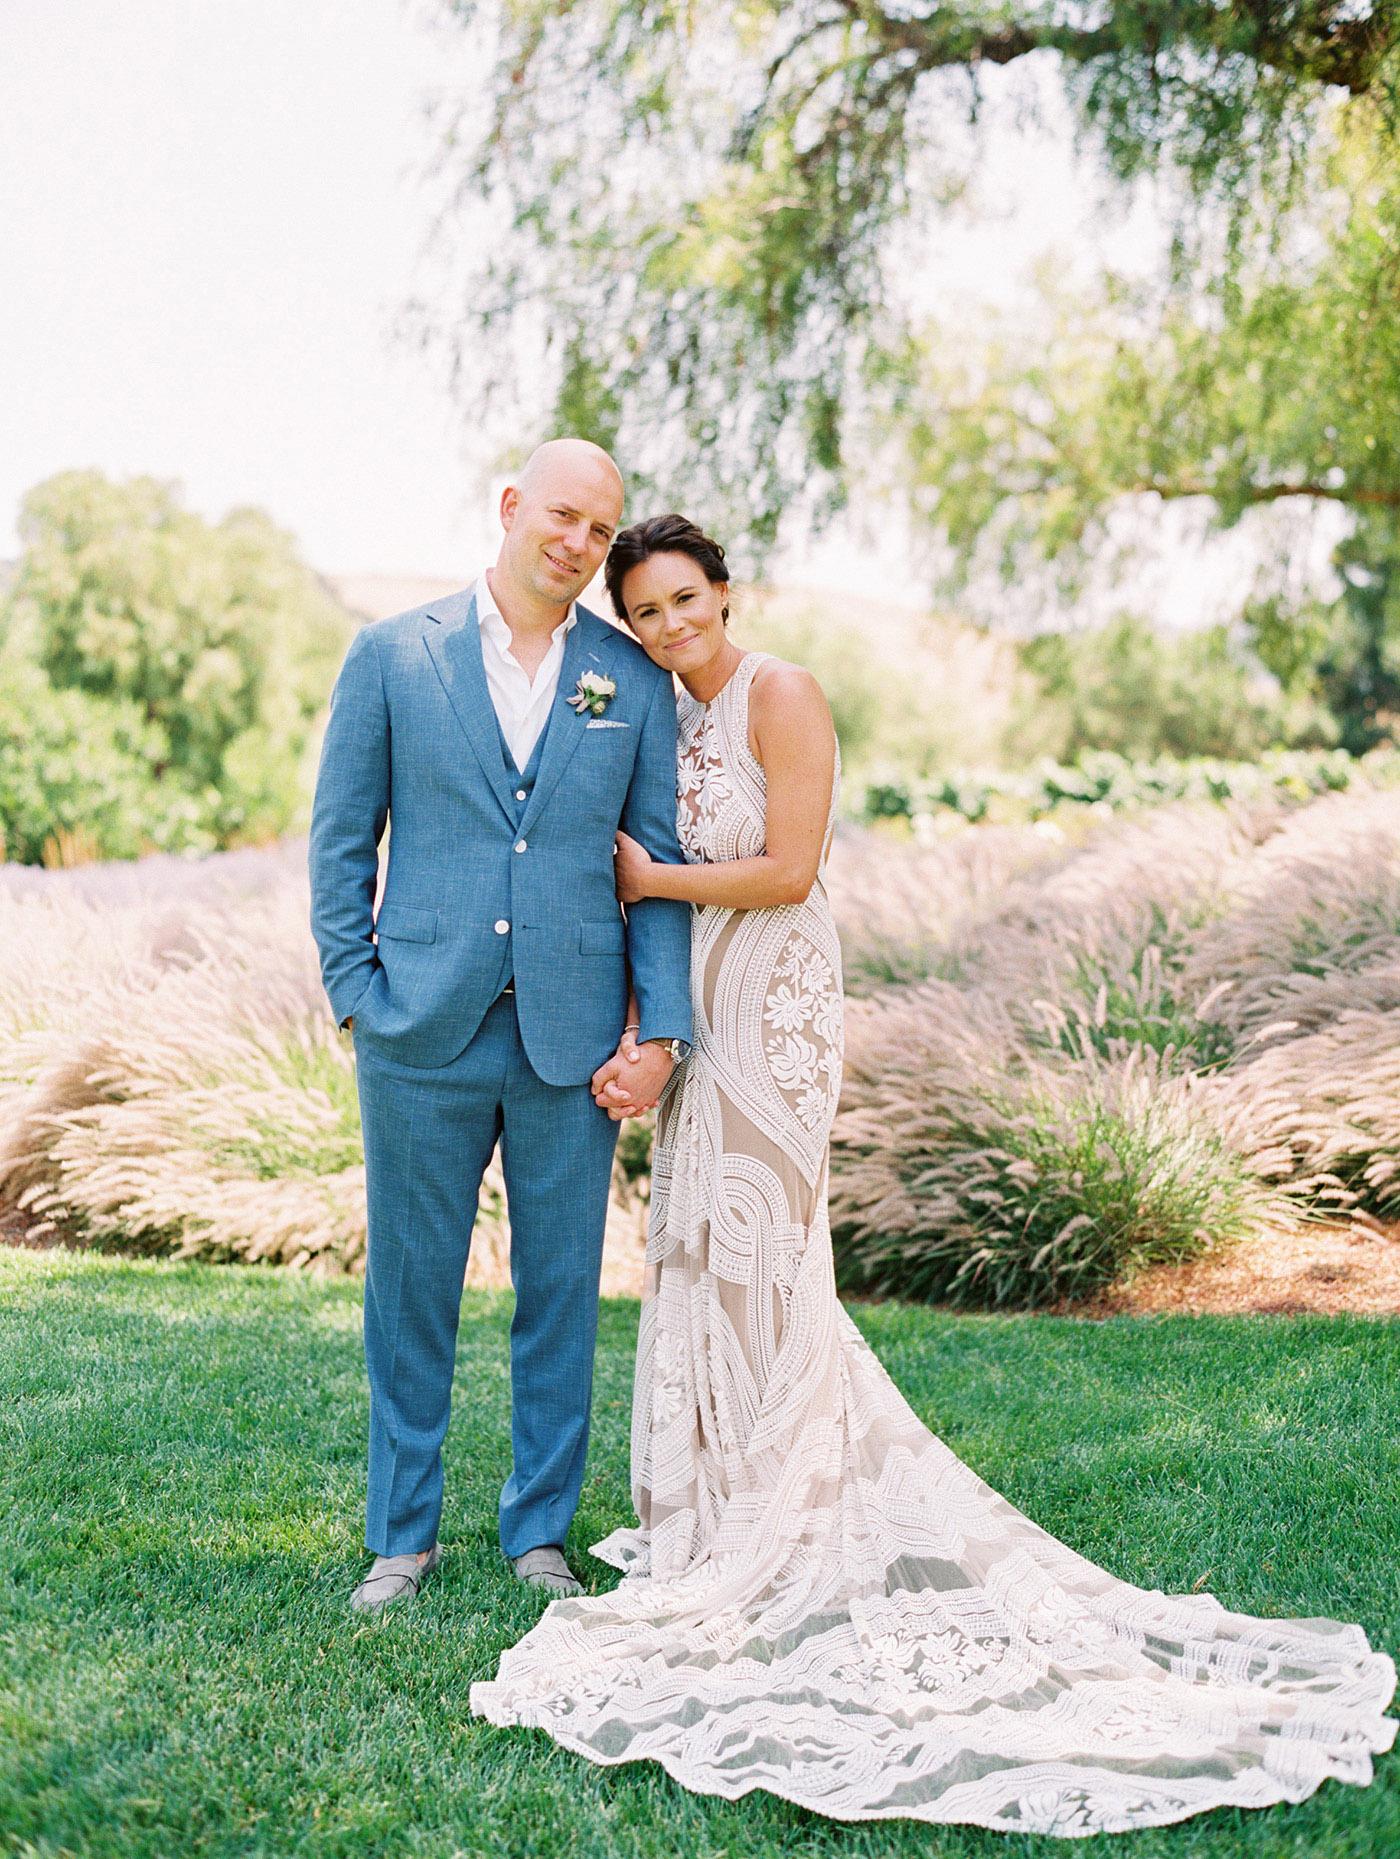 Caitlin and Fletcher wedding couple posing